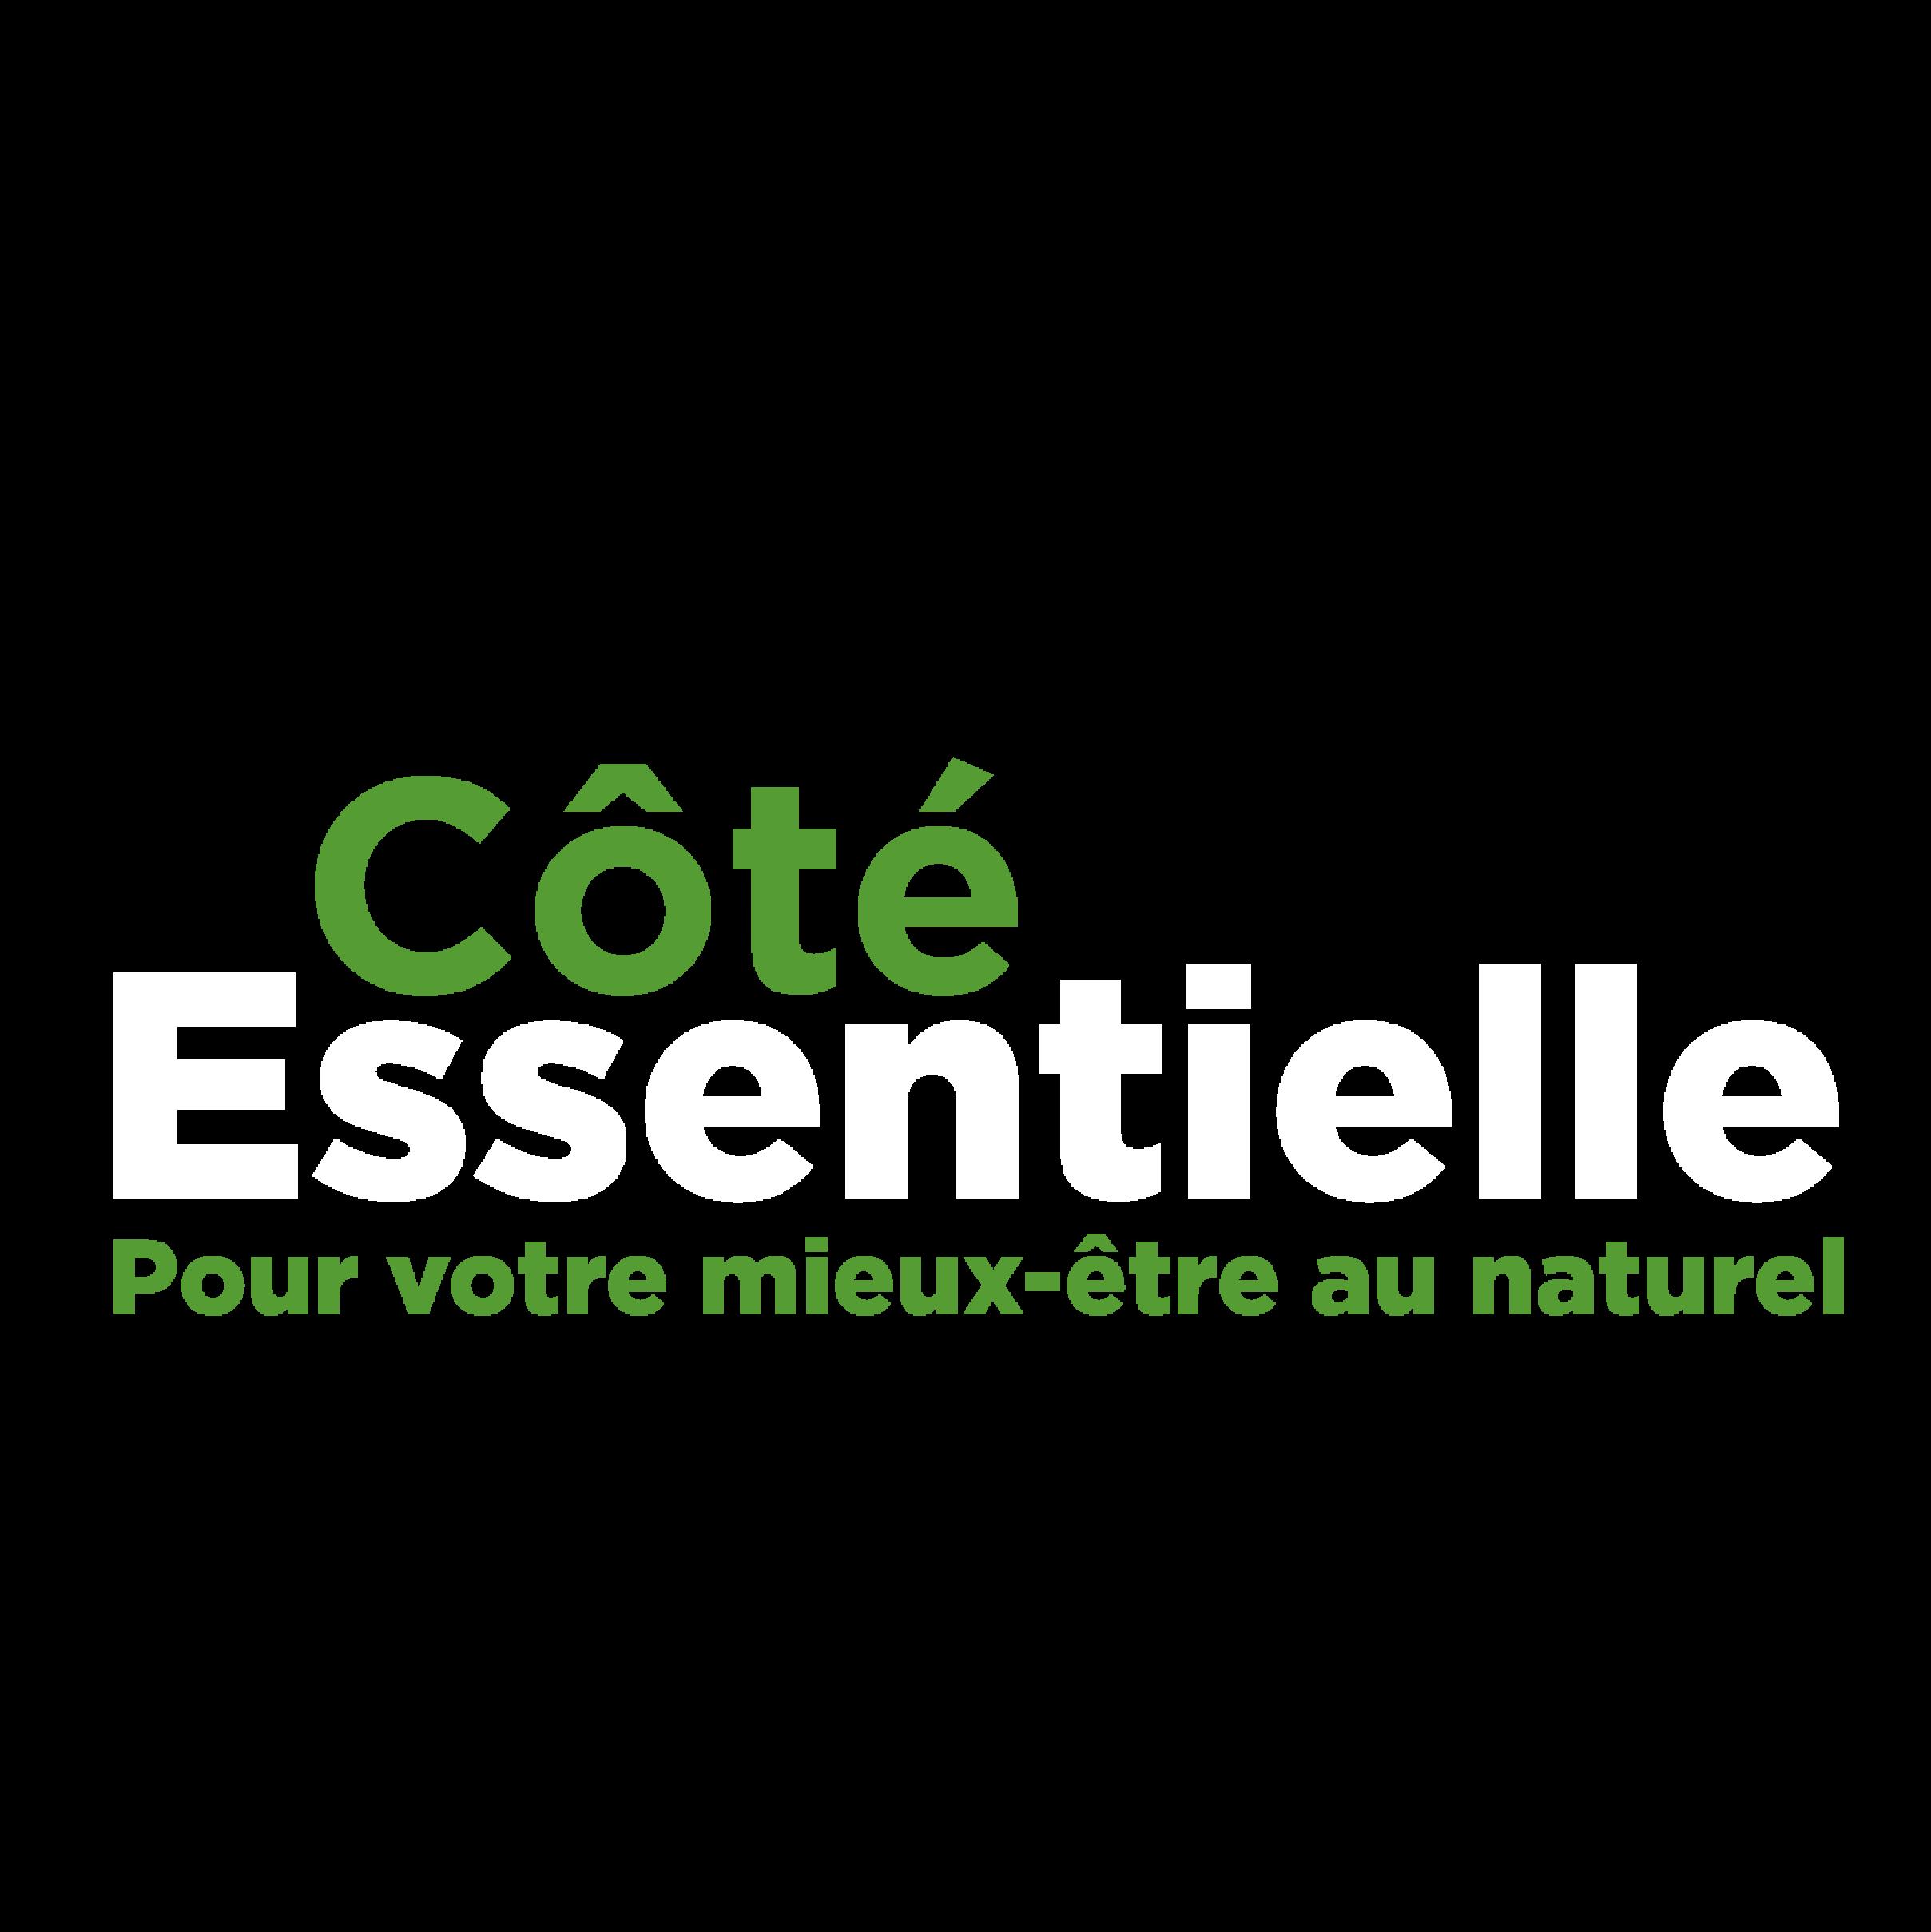 Côté Essentielle